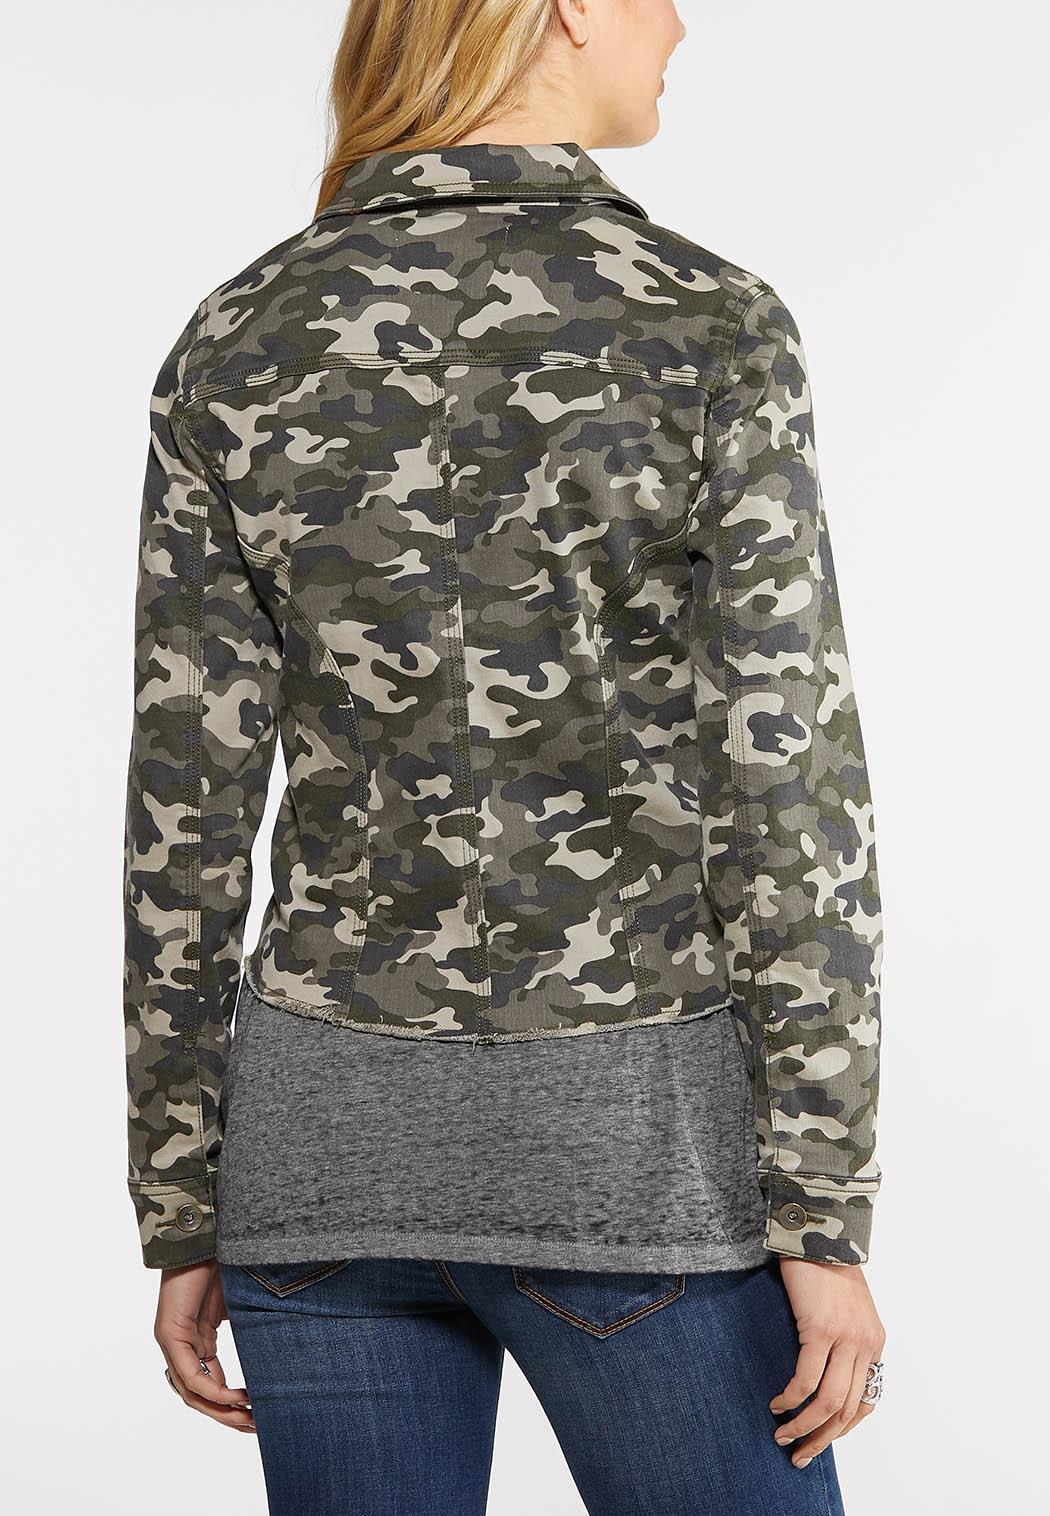 Raw Hem Camo Jacket (Item #43934926)